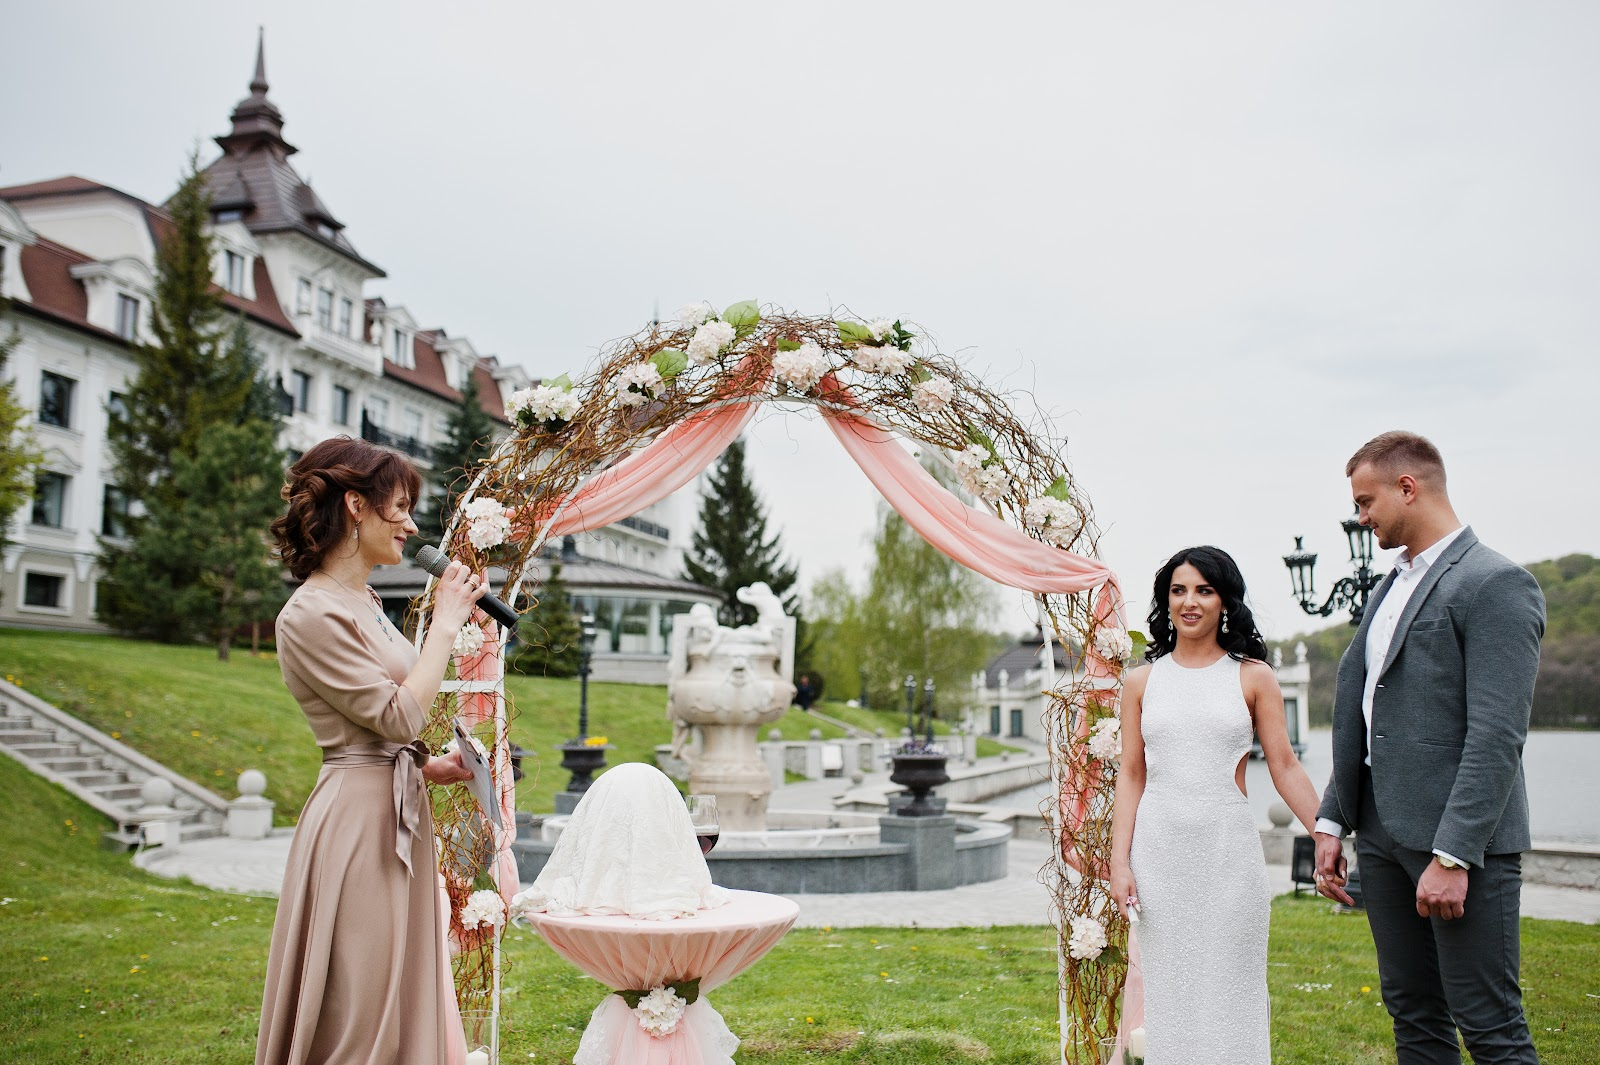 speeches to plan a wedding